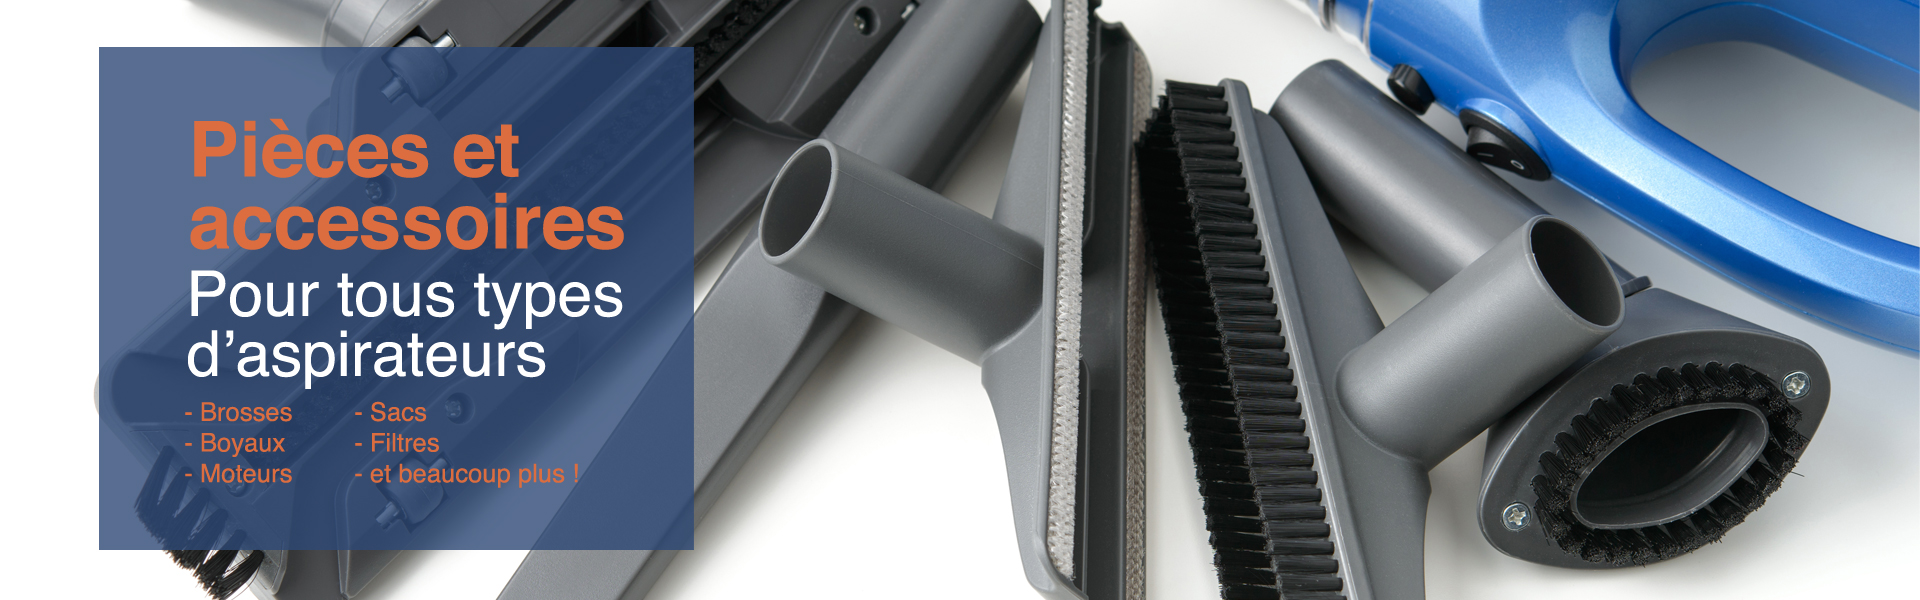 aspirateurs-samson-vente-reparation-accueil-1920x600-03